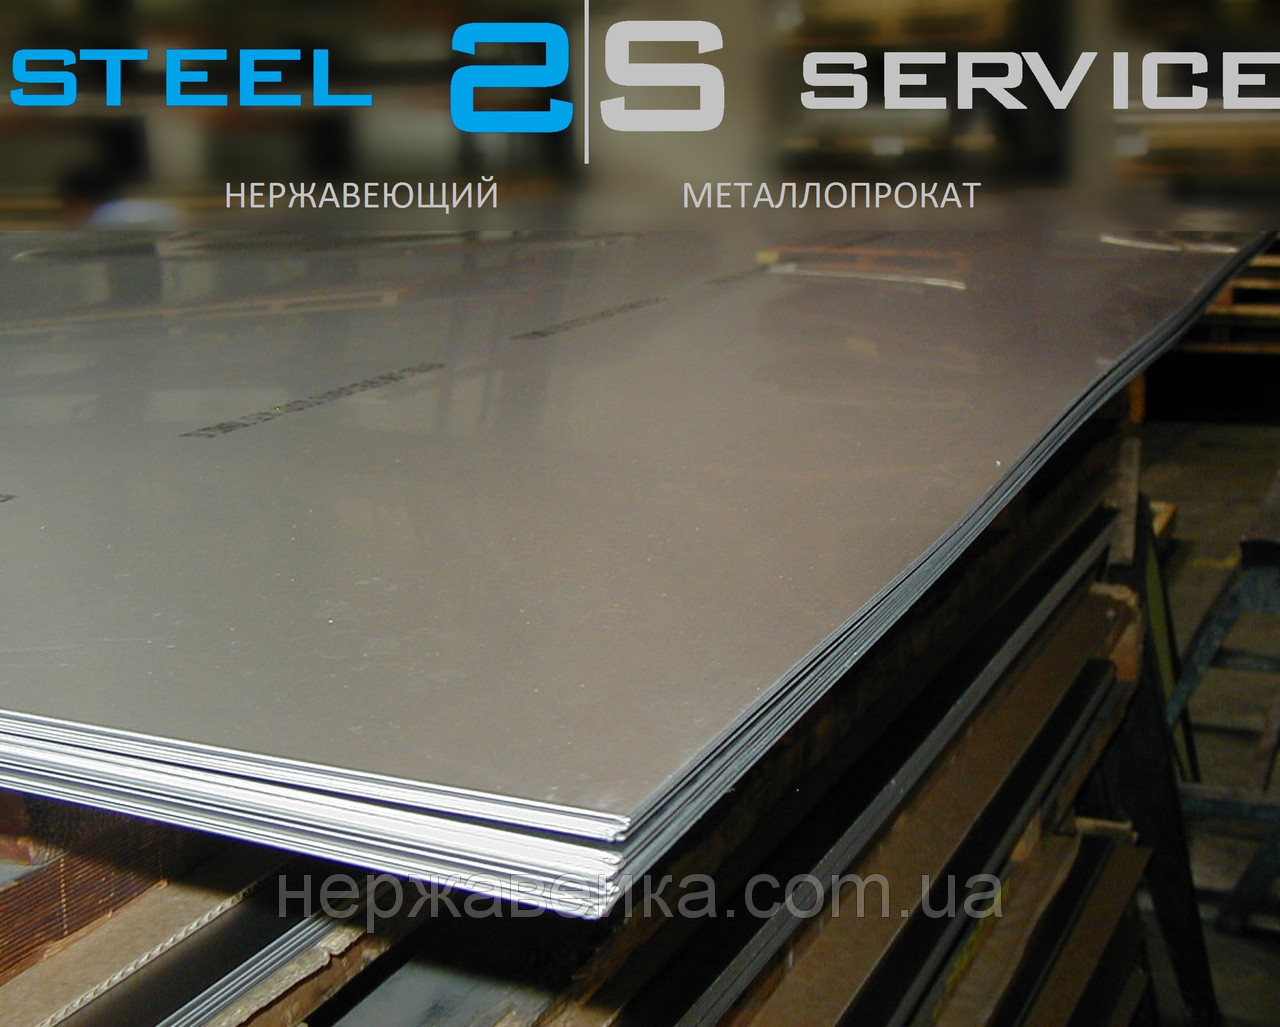 Нержавейка лист 6х1250х2500мм  AISI 316Ti(10Х17Н13М2Т) F1 - горячекатанный,  кислотостойкий